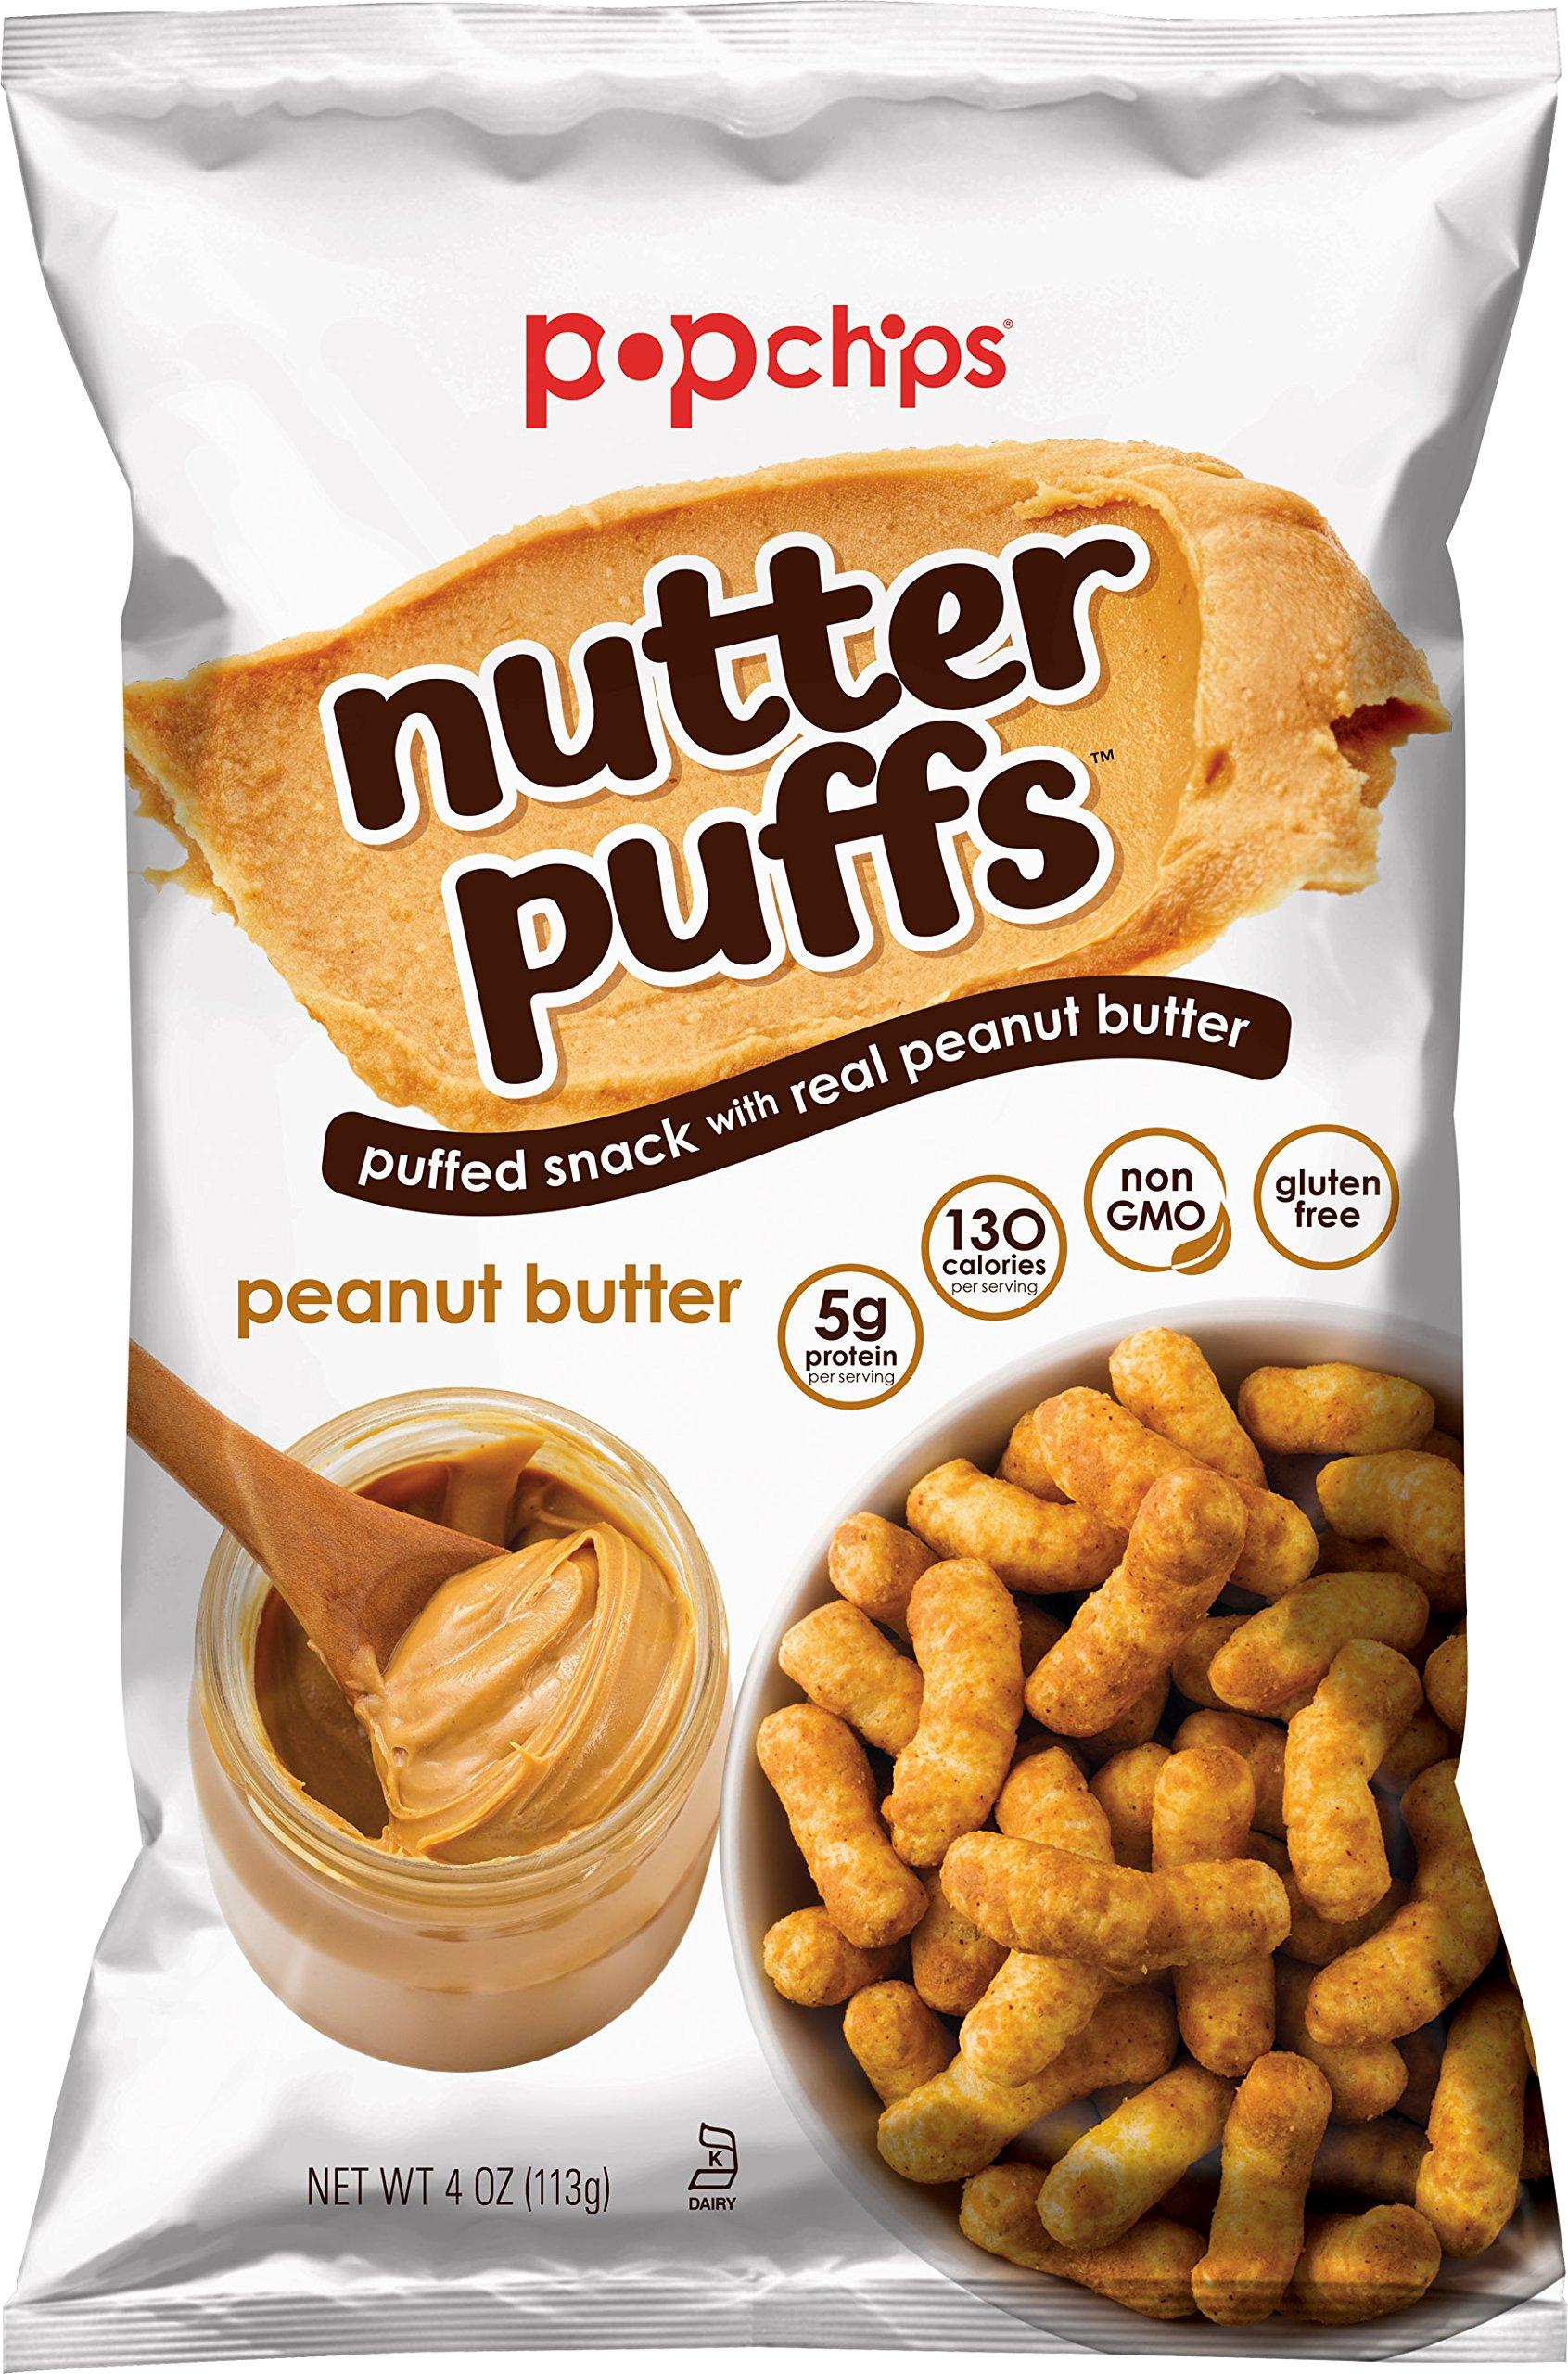 Popchips Nutter Puffs, Peanut Butter, 4 ounce, 12 Count